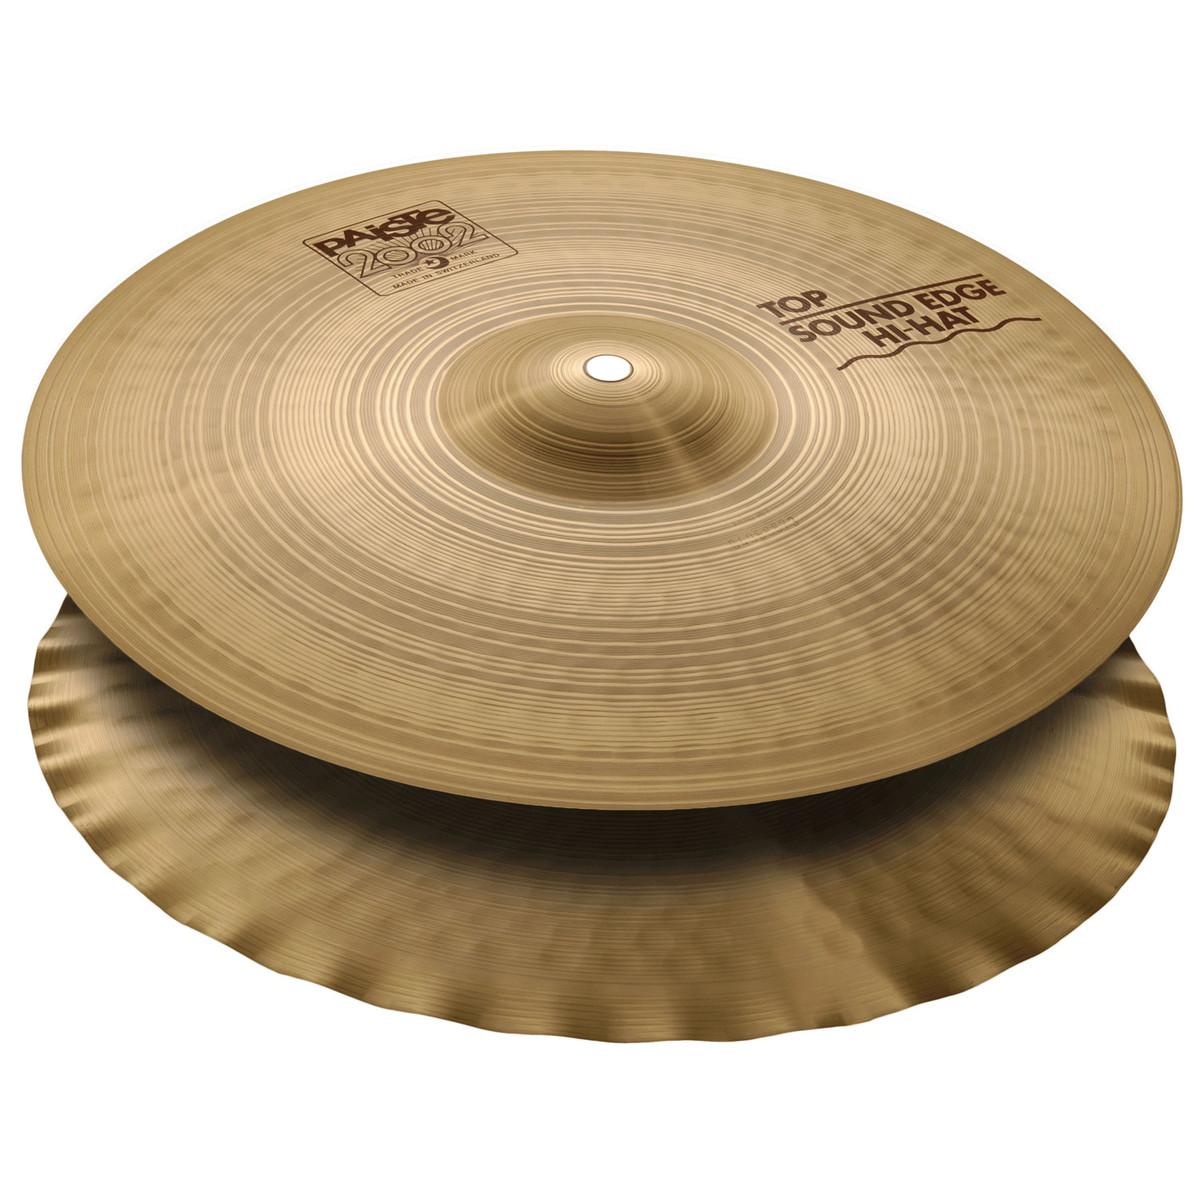 paiste 2002 15 39 39 sound edge hi hat cymbals at gear4music. Black Bedroom Furniture Sets. Home Design Ideas